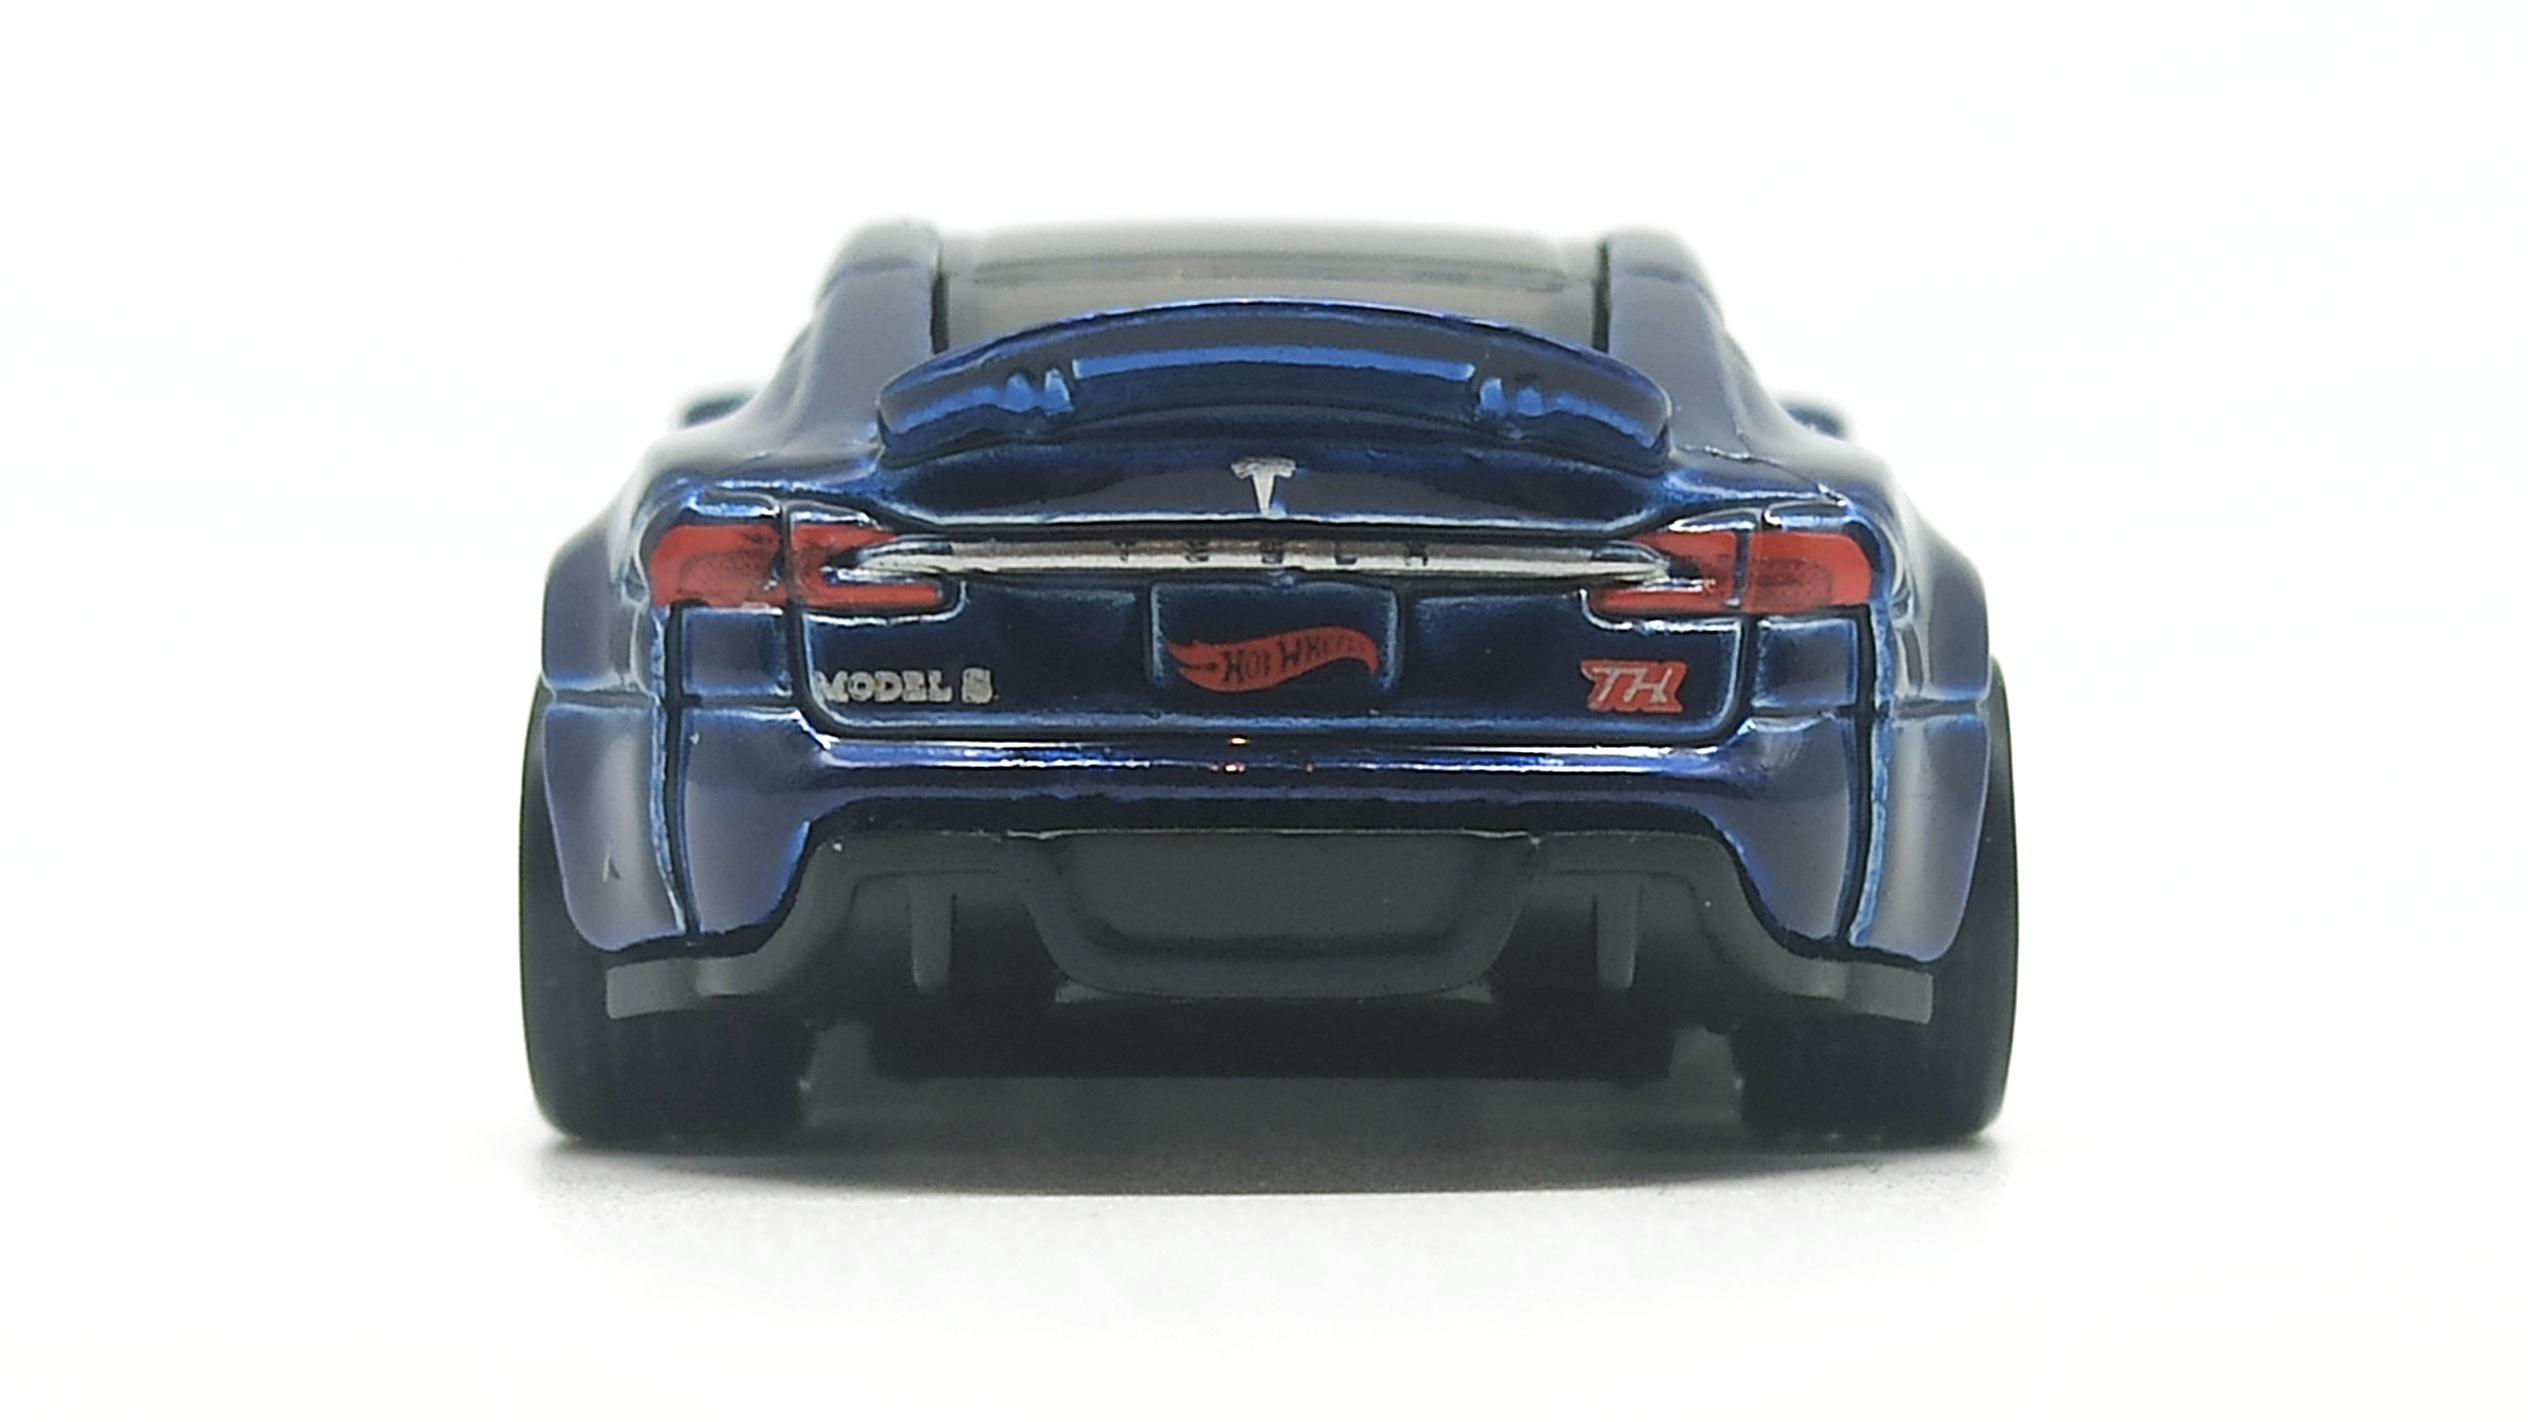 Hot Wheels Tesla Model S (FYG08) 2019 (226/250) HW Green Speed (4/5) indigo blue Super Treasure Hunt (STH) back